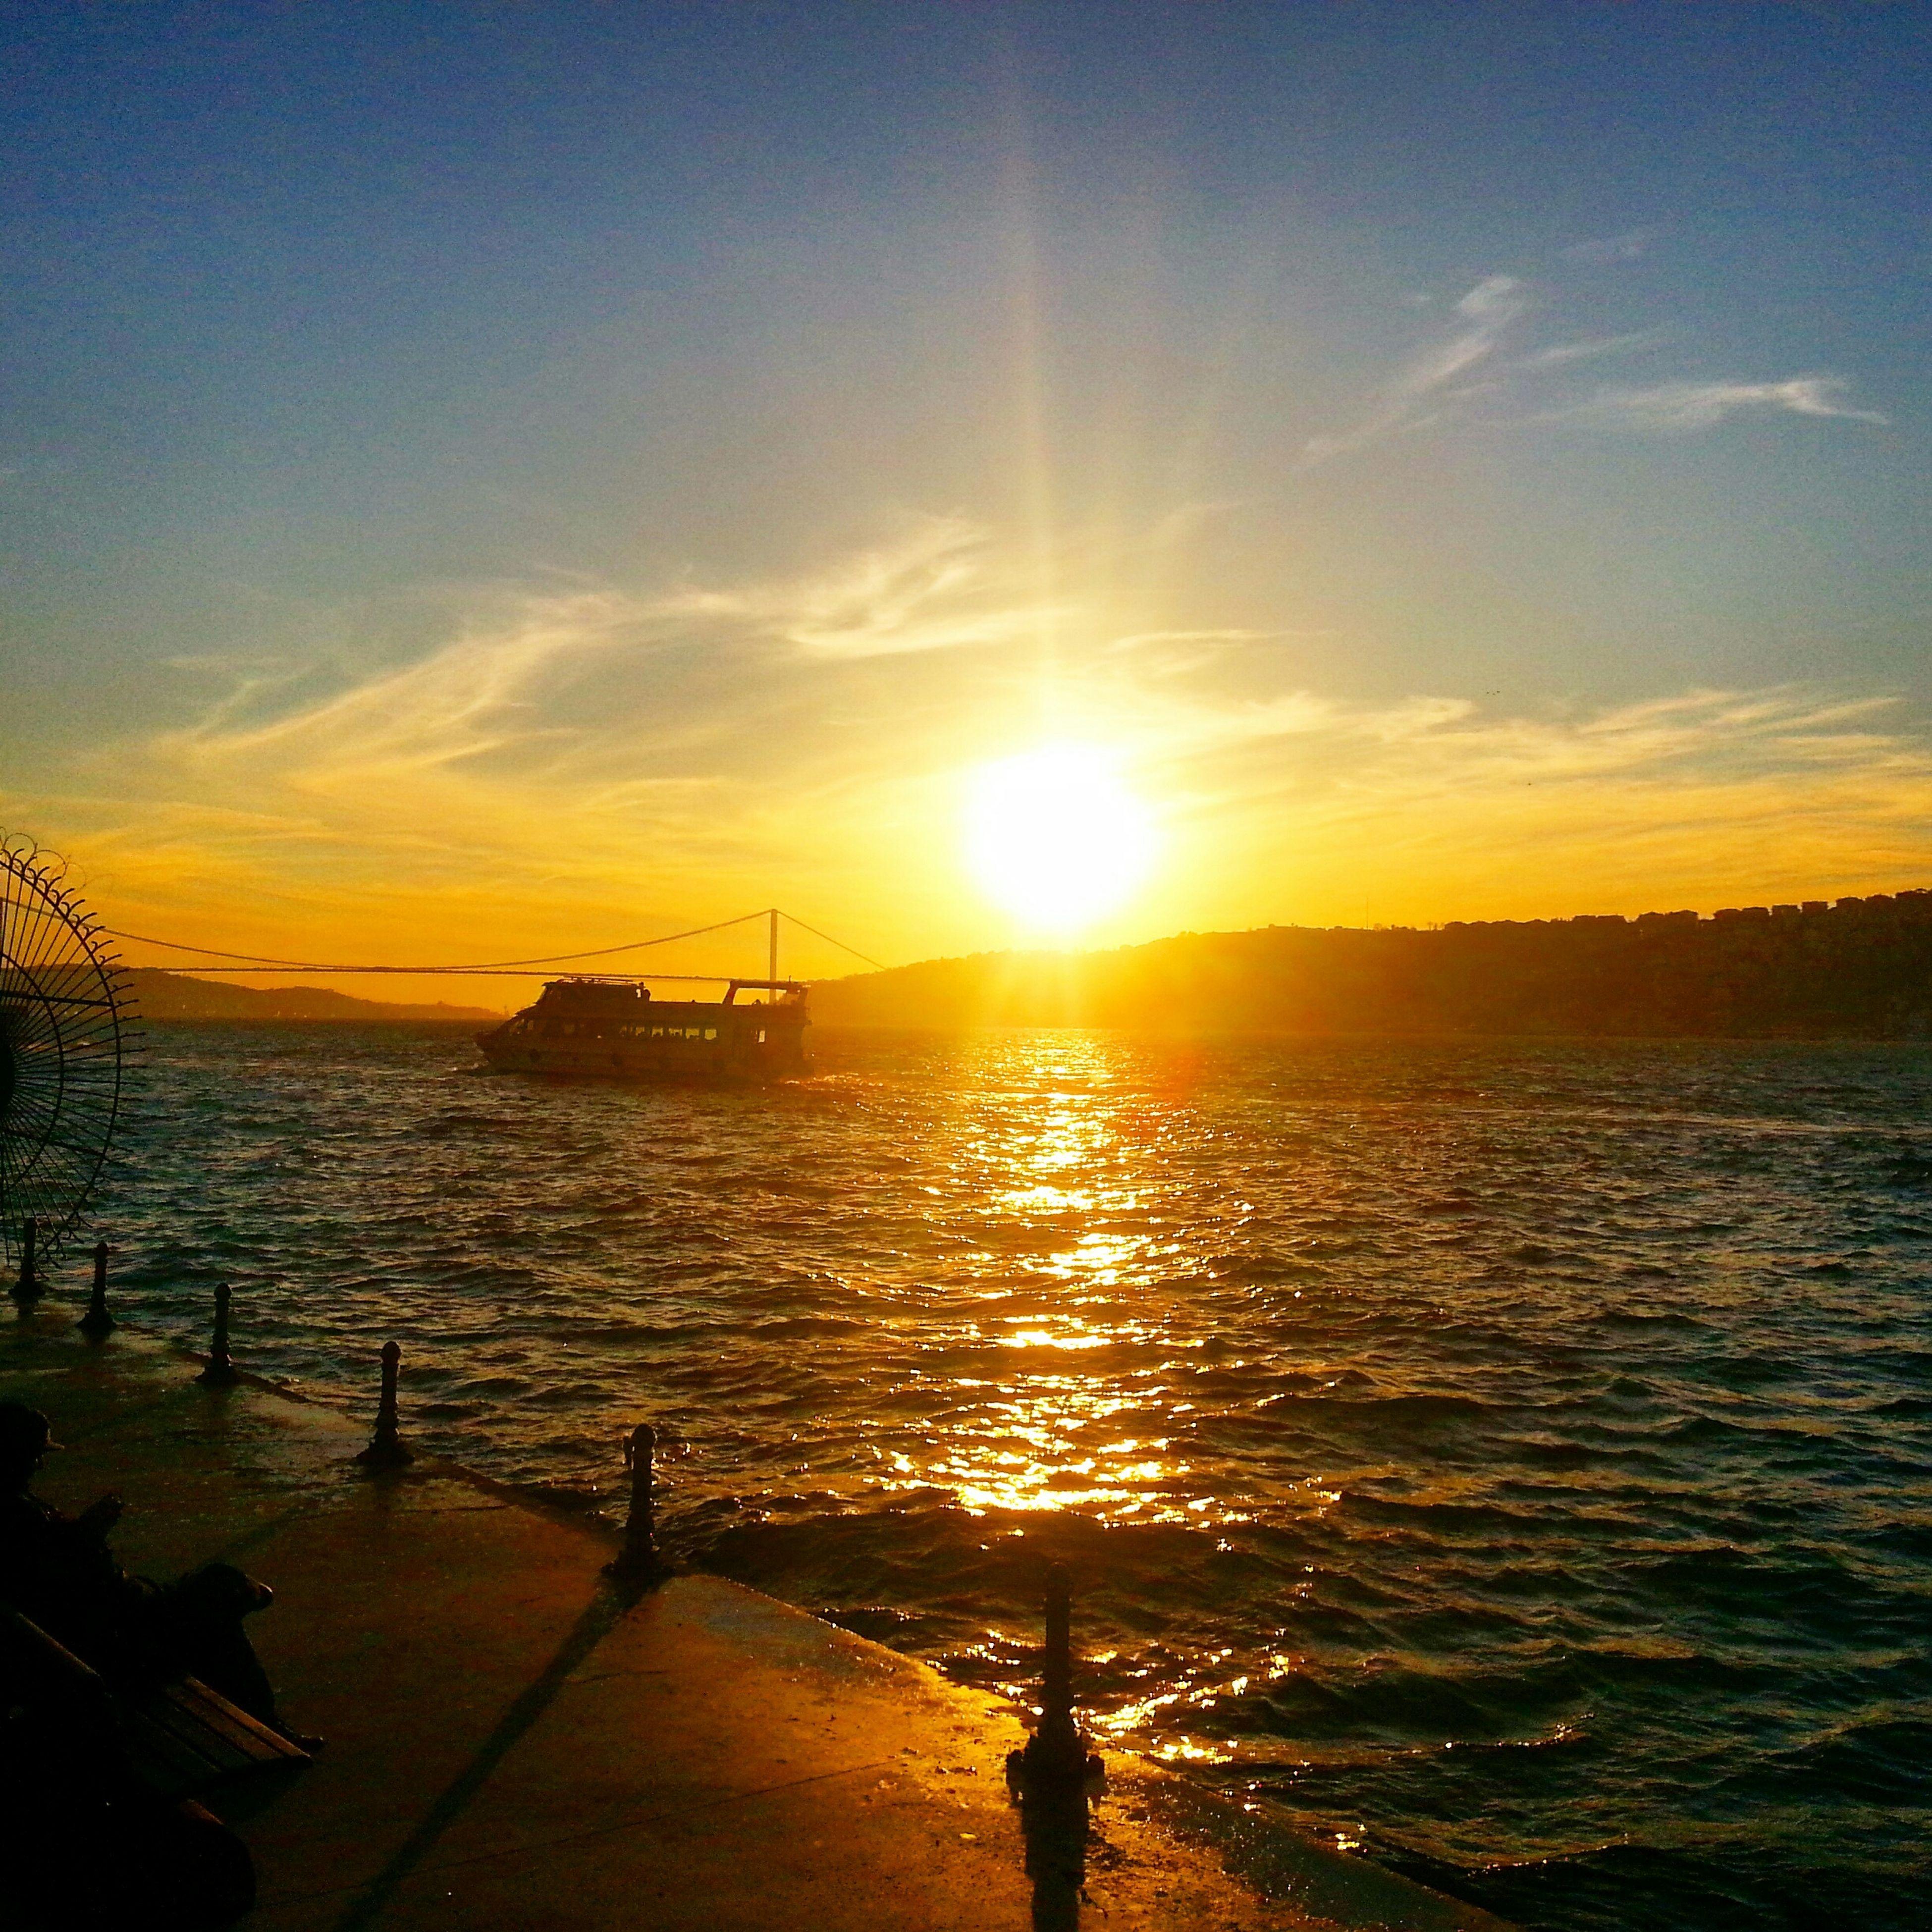 sunset, sun, water, sea, sky, transportation, sunlight, nautical vessel, scenics, horizon over water, beauty in nature, tranquil scene, mode of transport, tranquility, sunbeam, orange color, nature, boat, reflection, idyllic